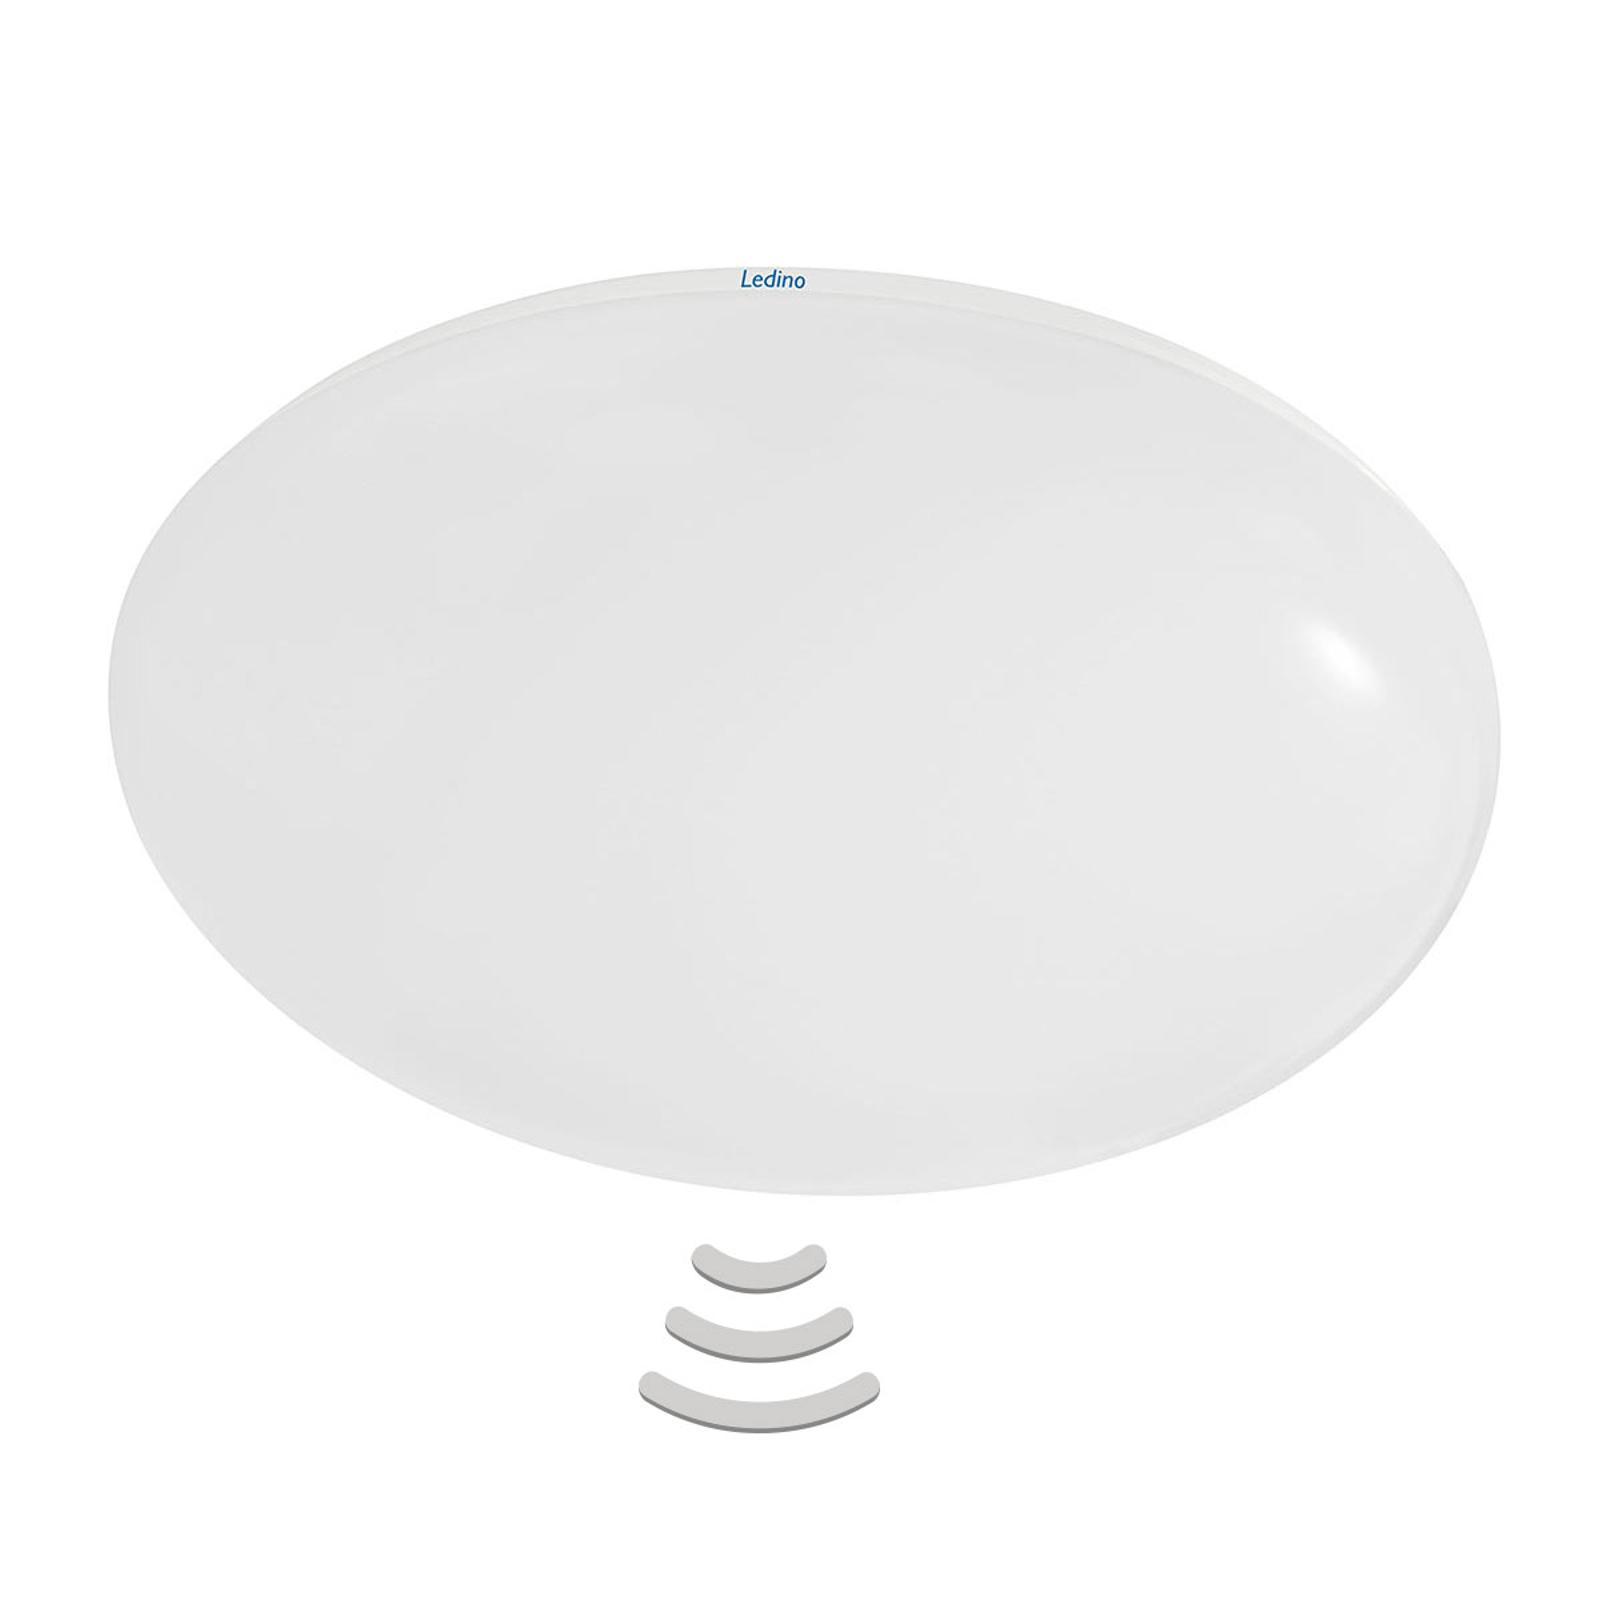 Potente plafoniera LED Altona con sensore - Plafoniere con sensore - Plafoniere - Illuminazione interni